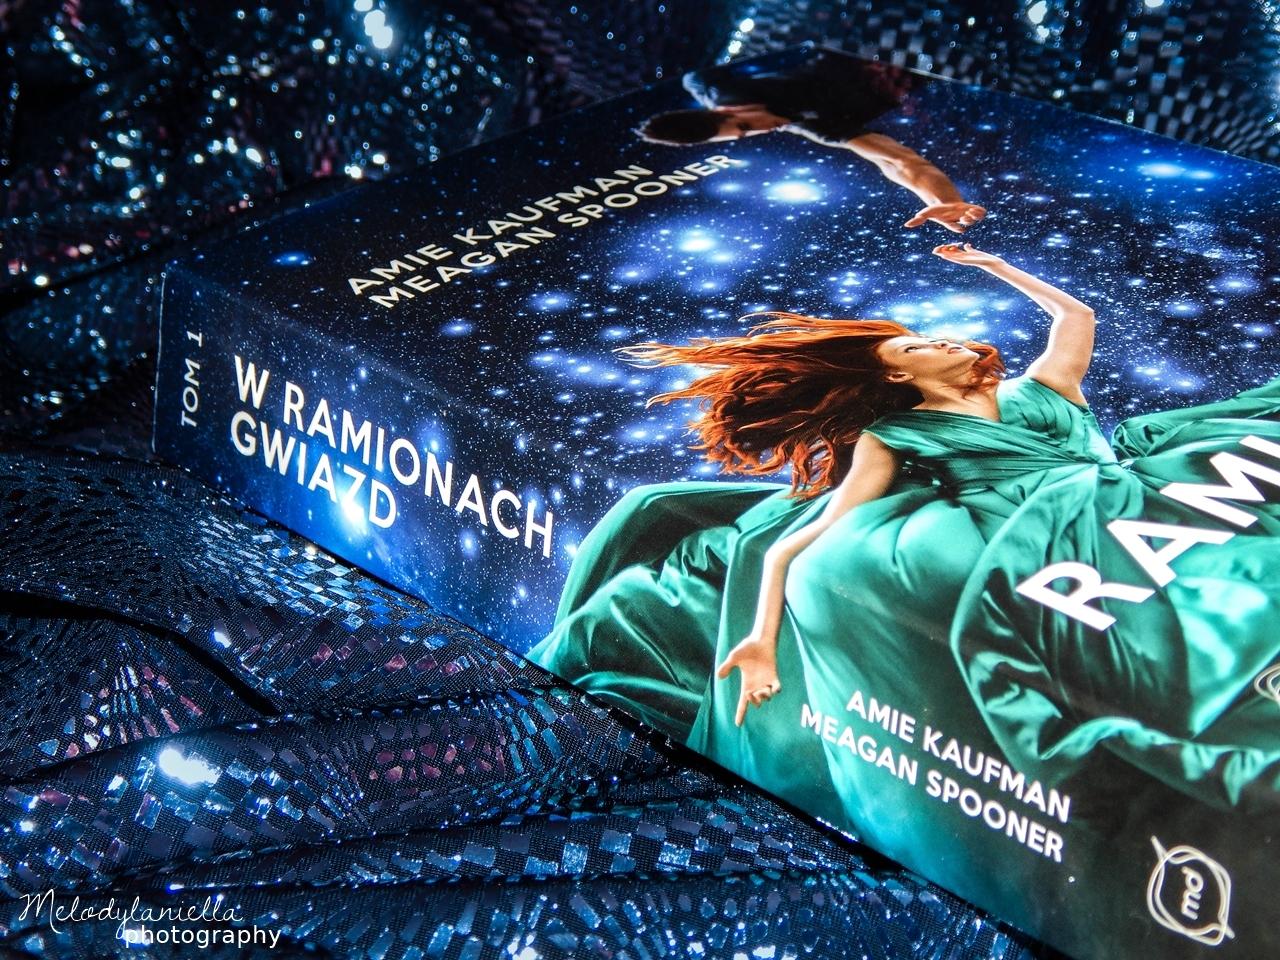 these broken stars w ramionach gwiazd book ksiazka kaufman spooner